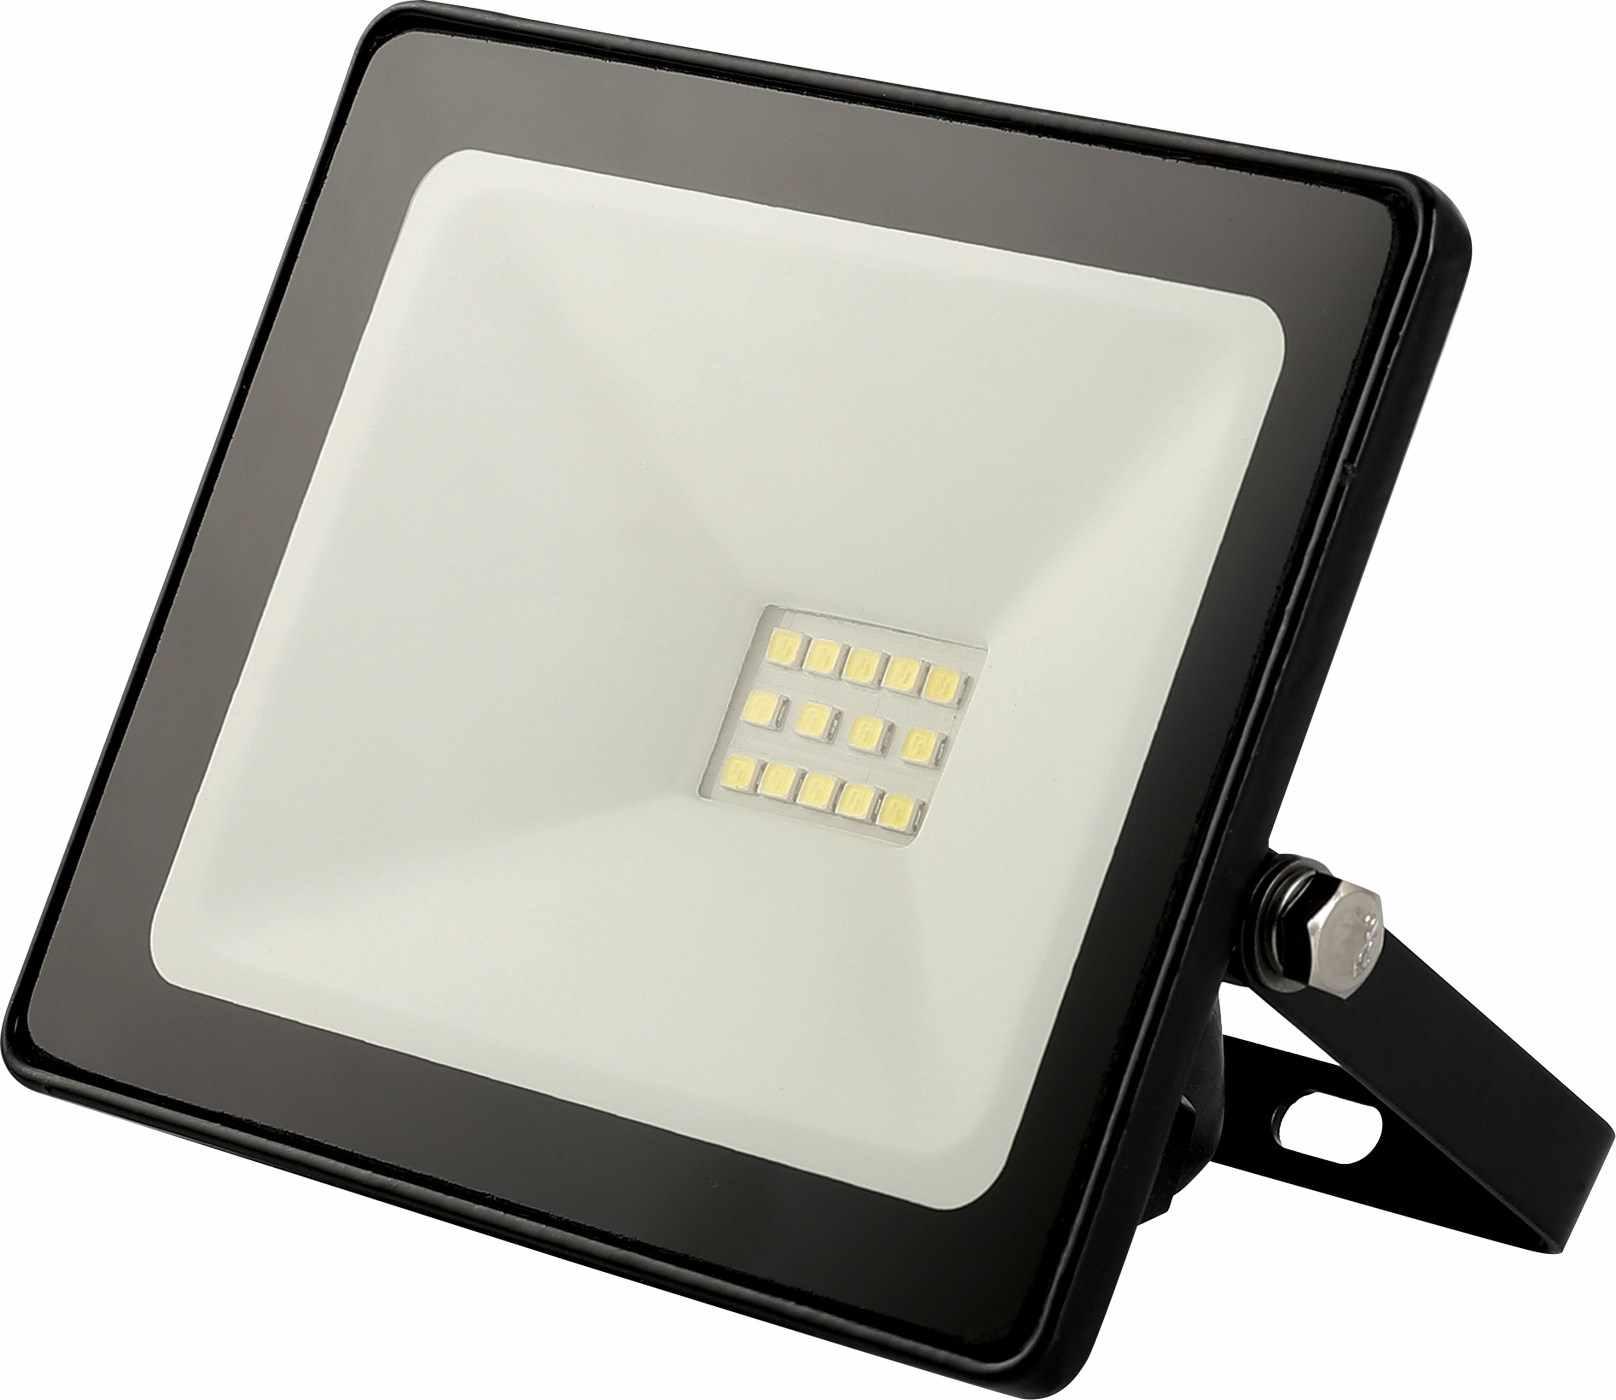 LED reflektor SMD HALO SMD 20W NW, 4000K, 1900lm, IP65, Greenlux GXLR007